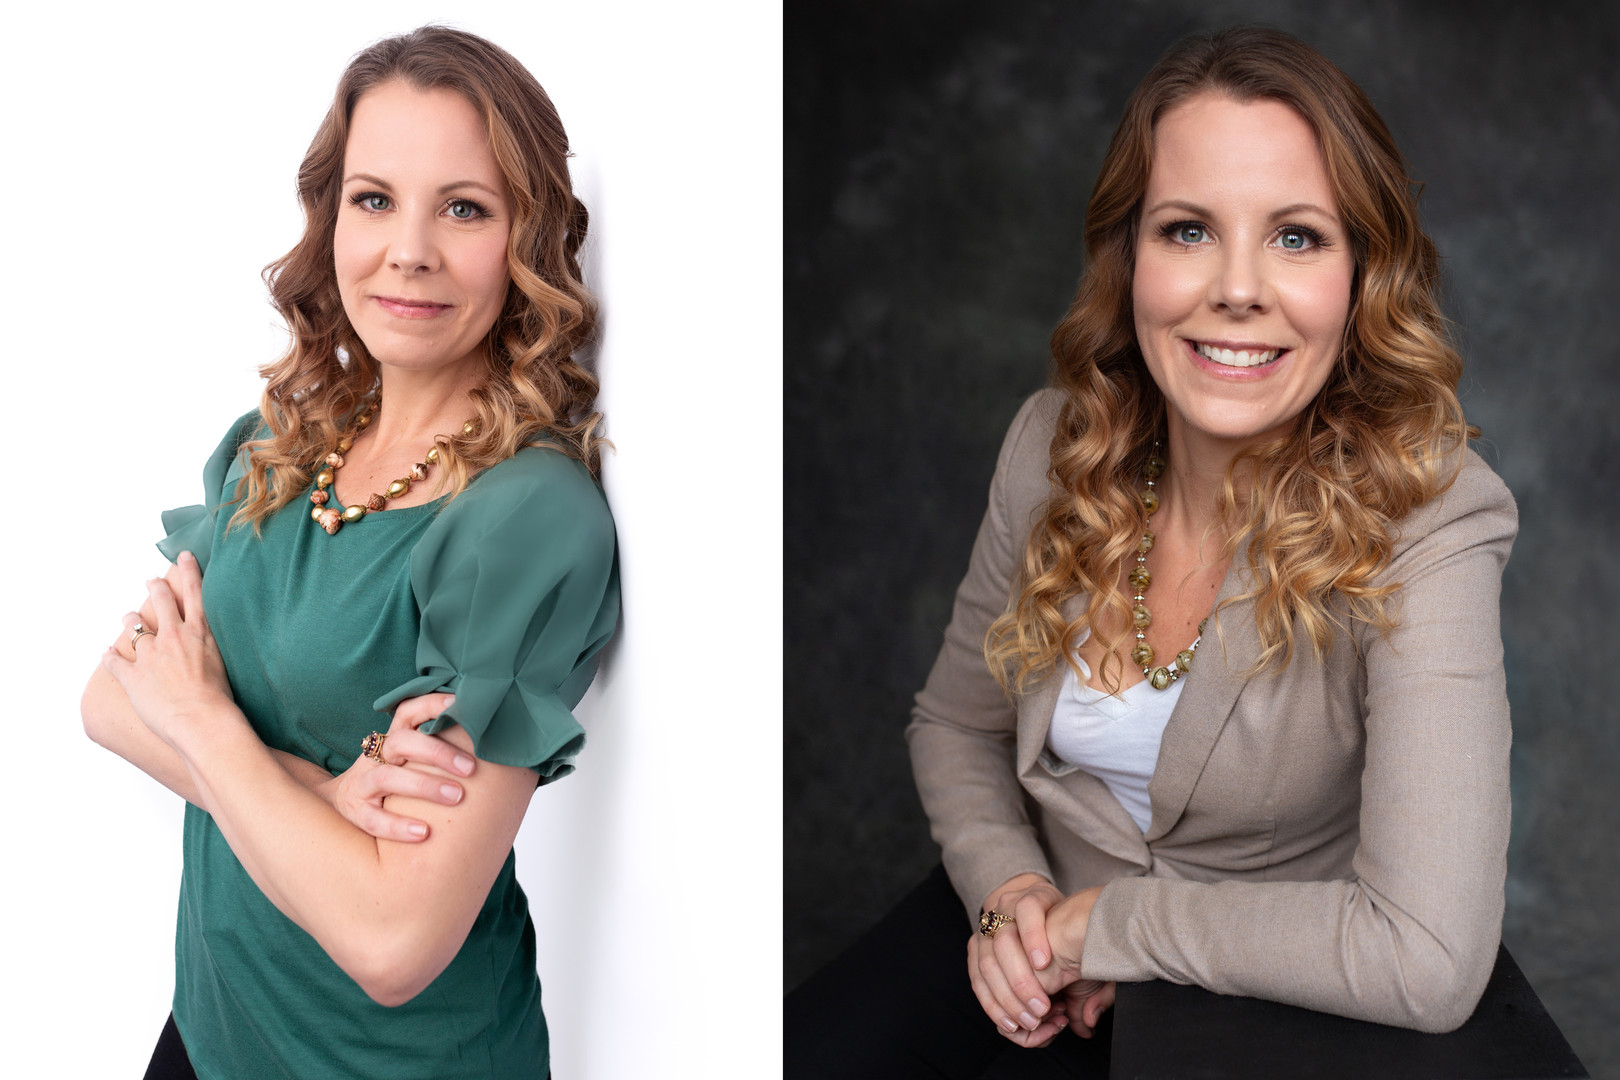 sarah side by side.jpg